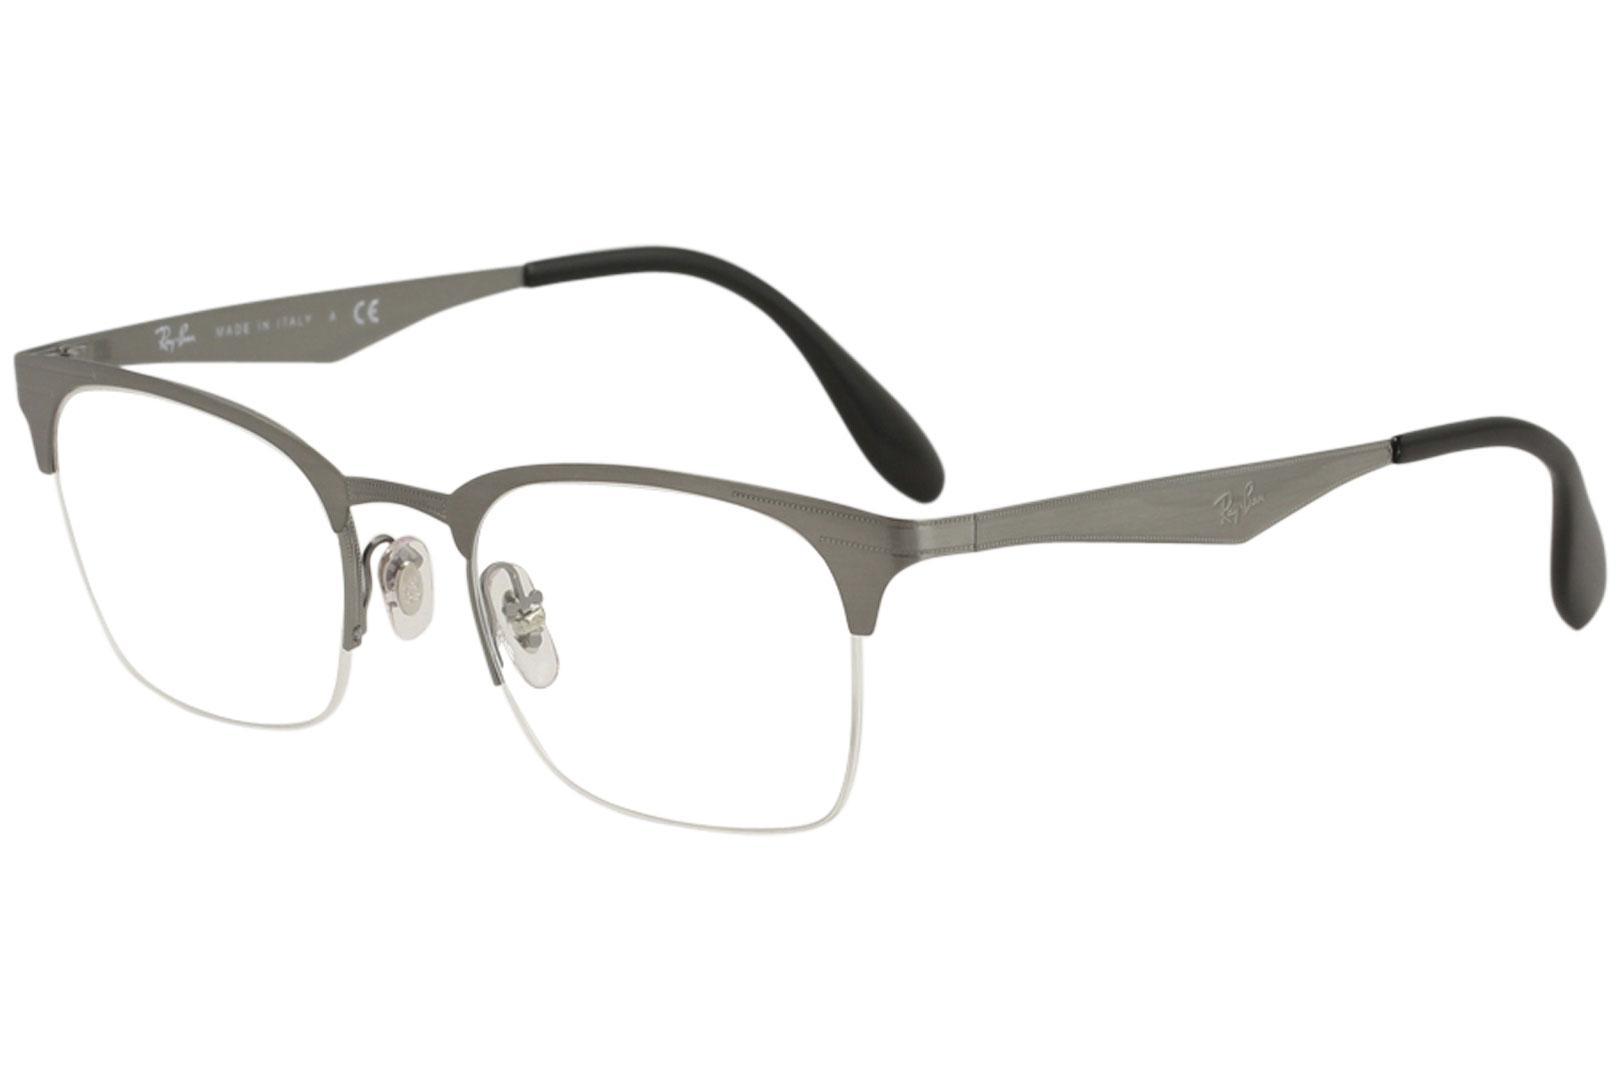 39e50c1ed166 Ray Ban Eyeglasses RX6360 RB/6360 RayBan Half Rim Optical Frame